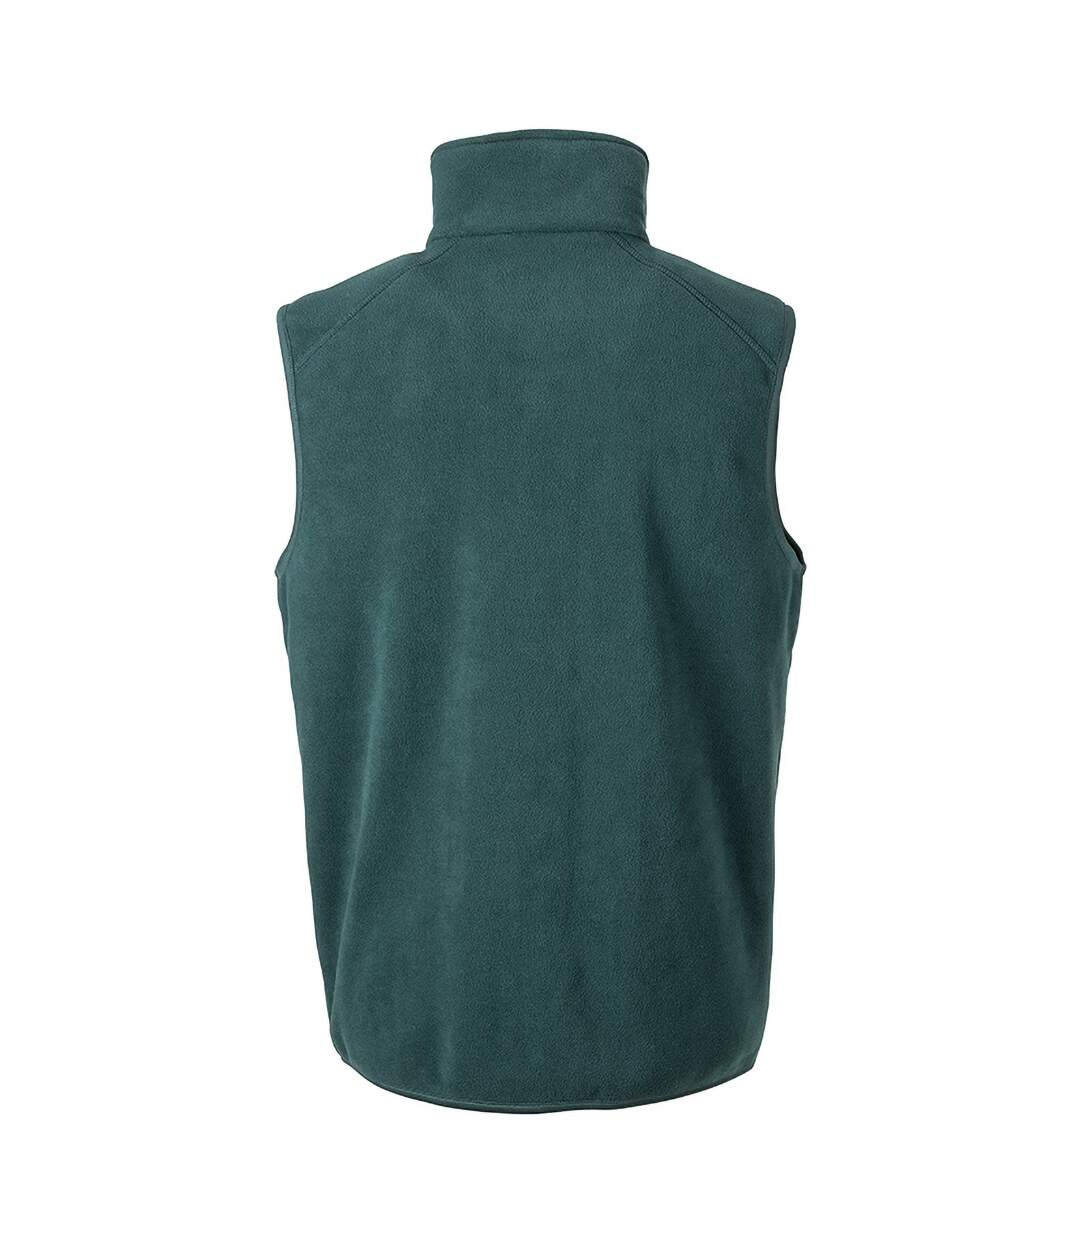 Result Core Mens Micro Fleece Gilet (Orange) - UTPC3013